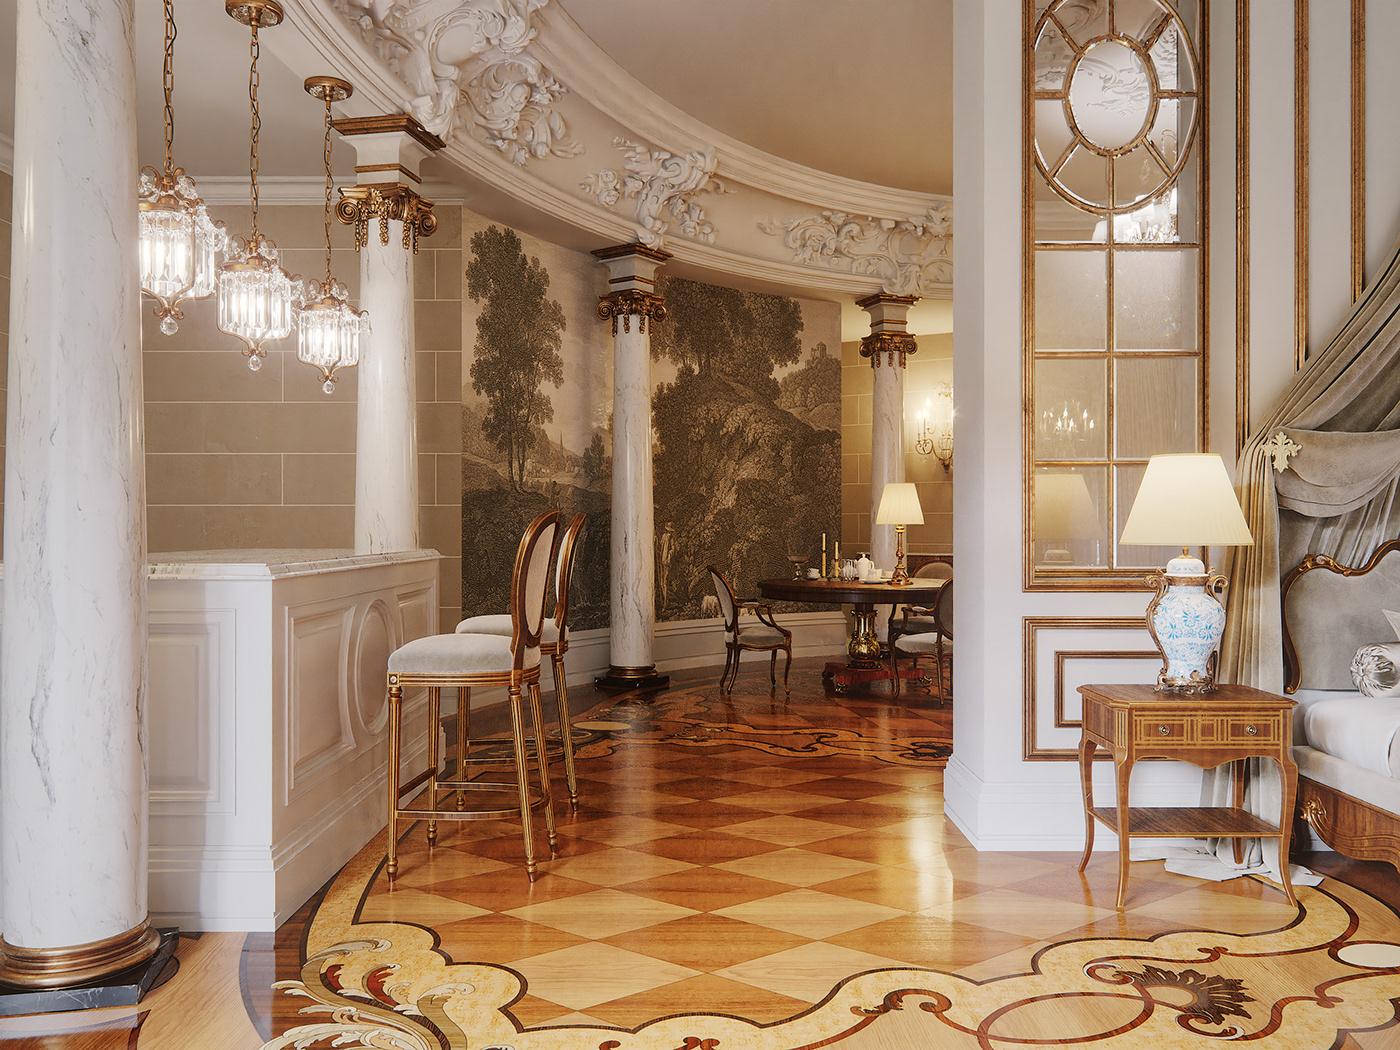 Interior kiev Barocco clasics bedroom provasi Marble